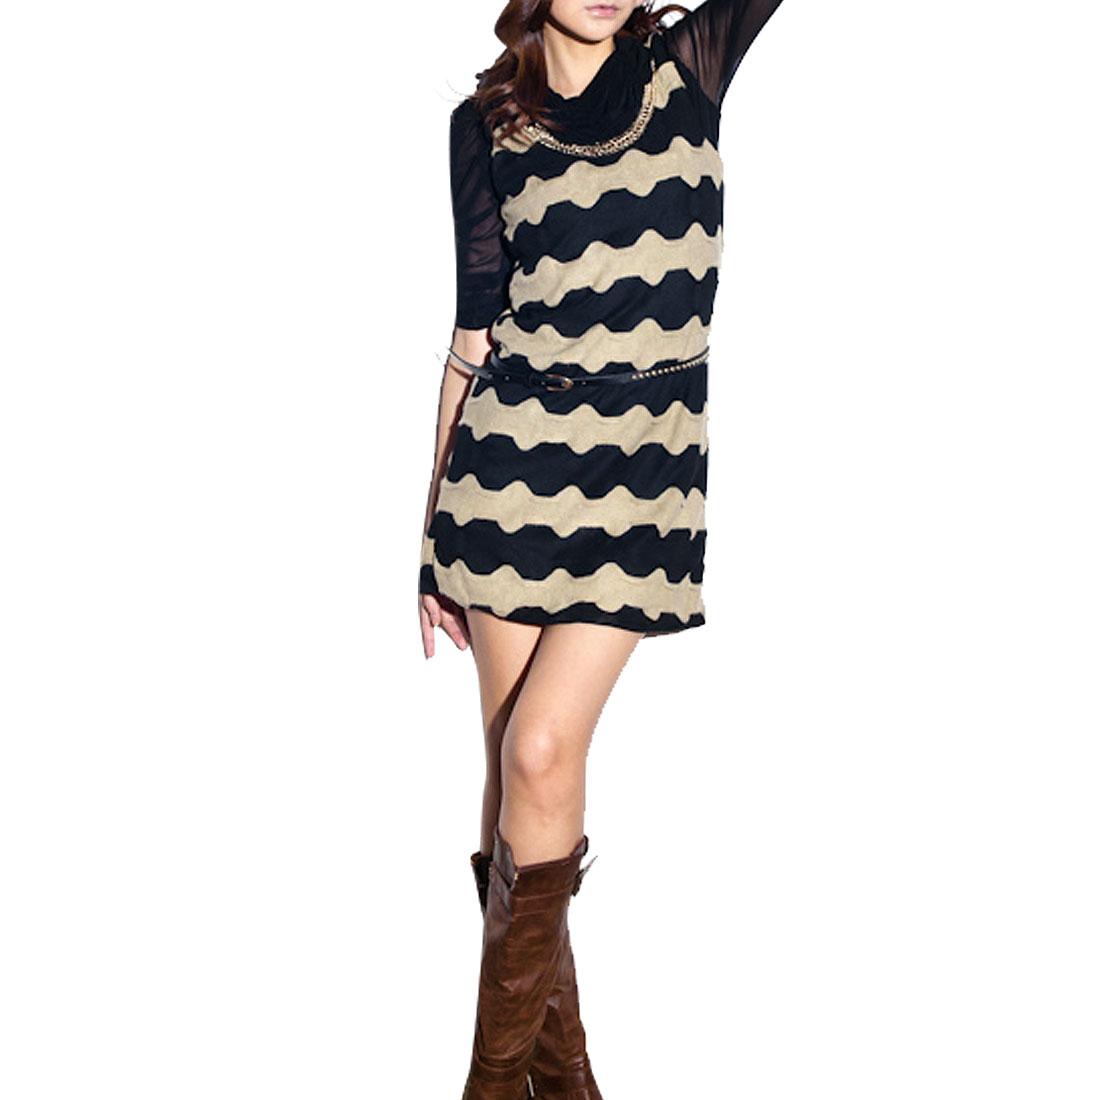 Women XS Gold Tone Chain Decor Black Khaki Knitting Tunic Shirt